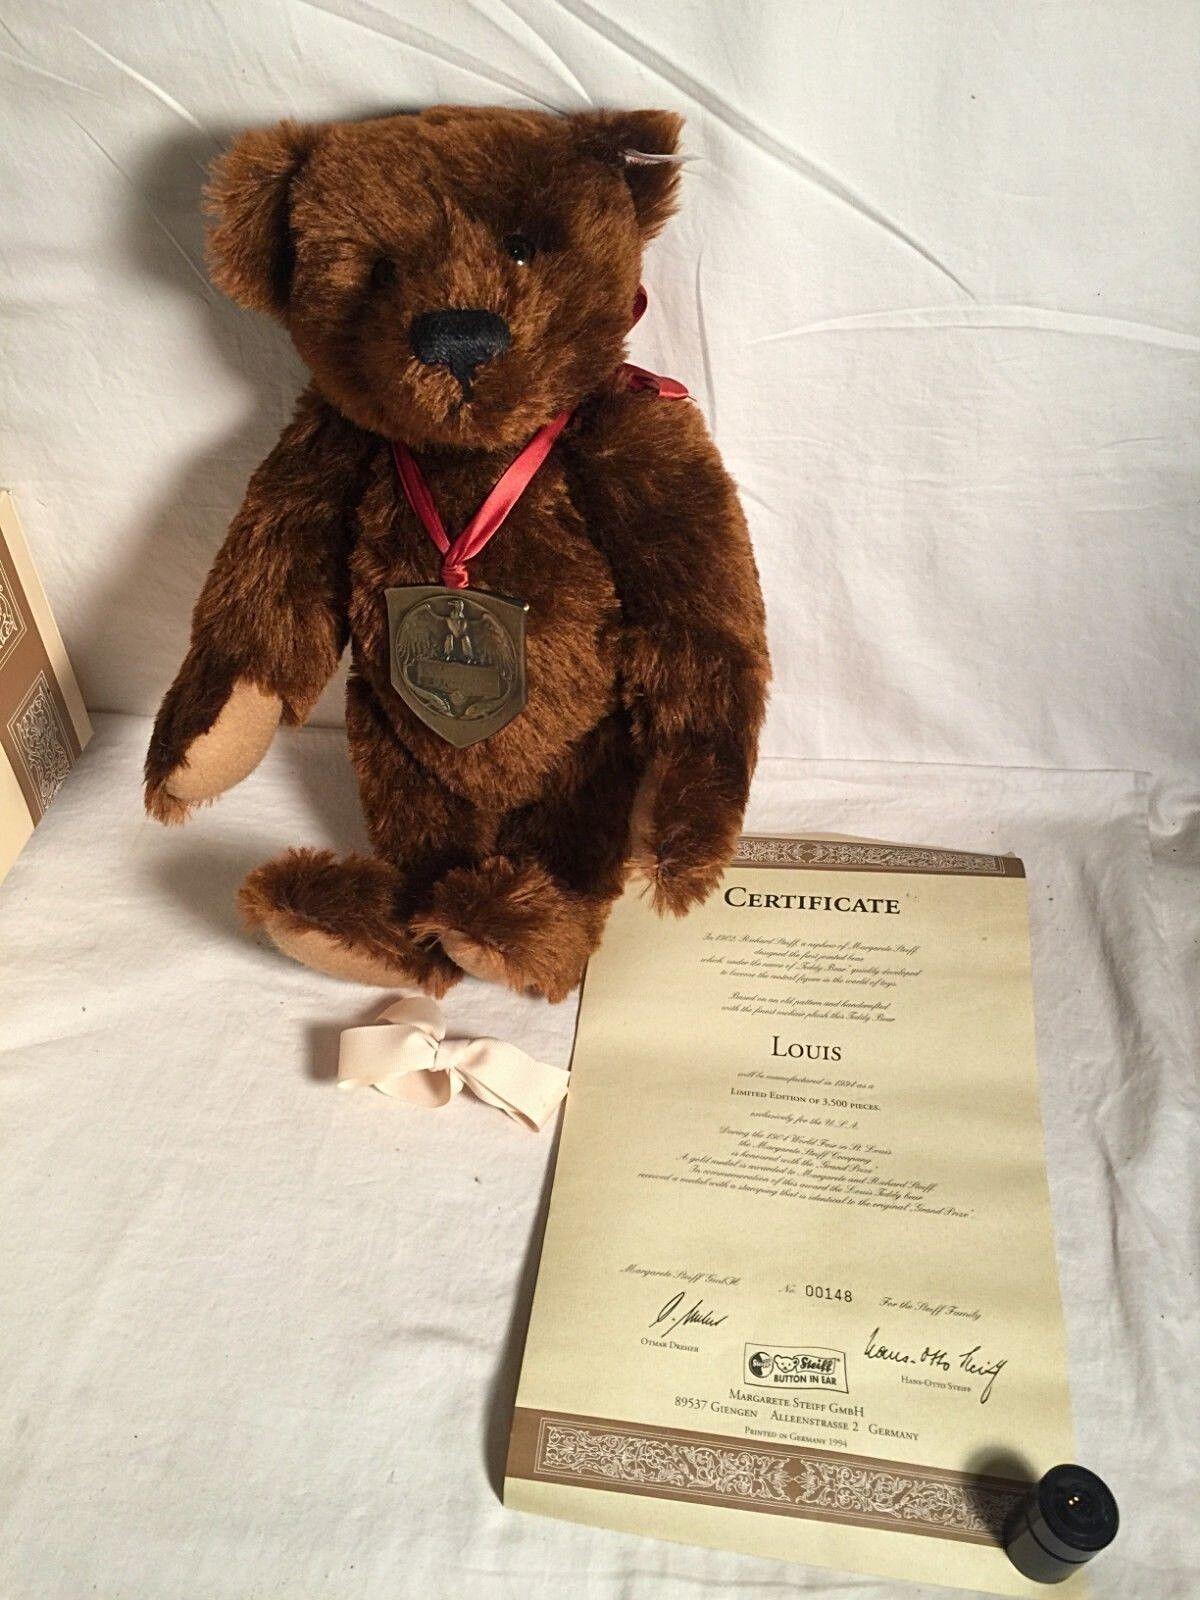 1994 Steiff LOUIS Teddy Bear 44 + COA Limited US Edition LOUISIANA Purchase EXPO